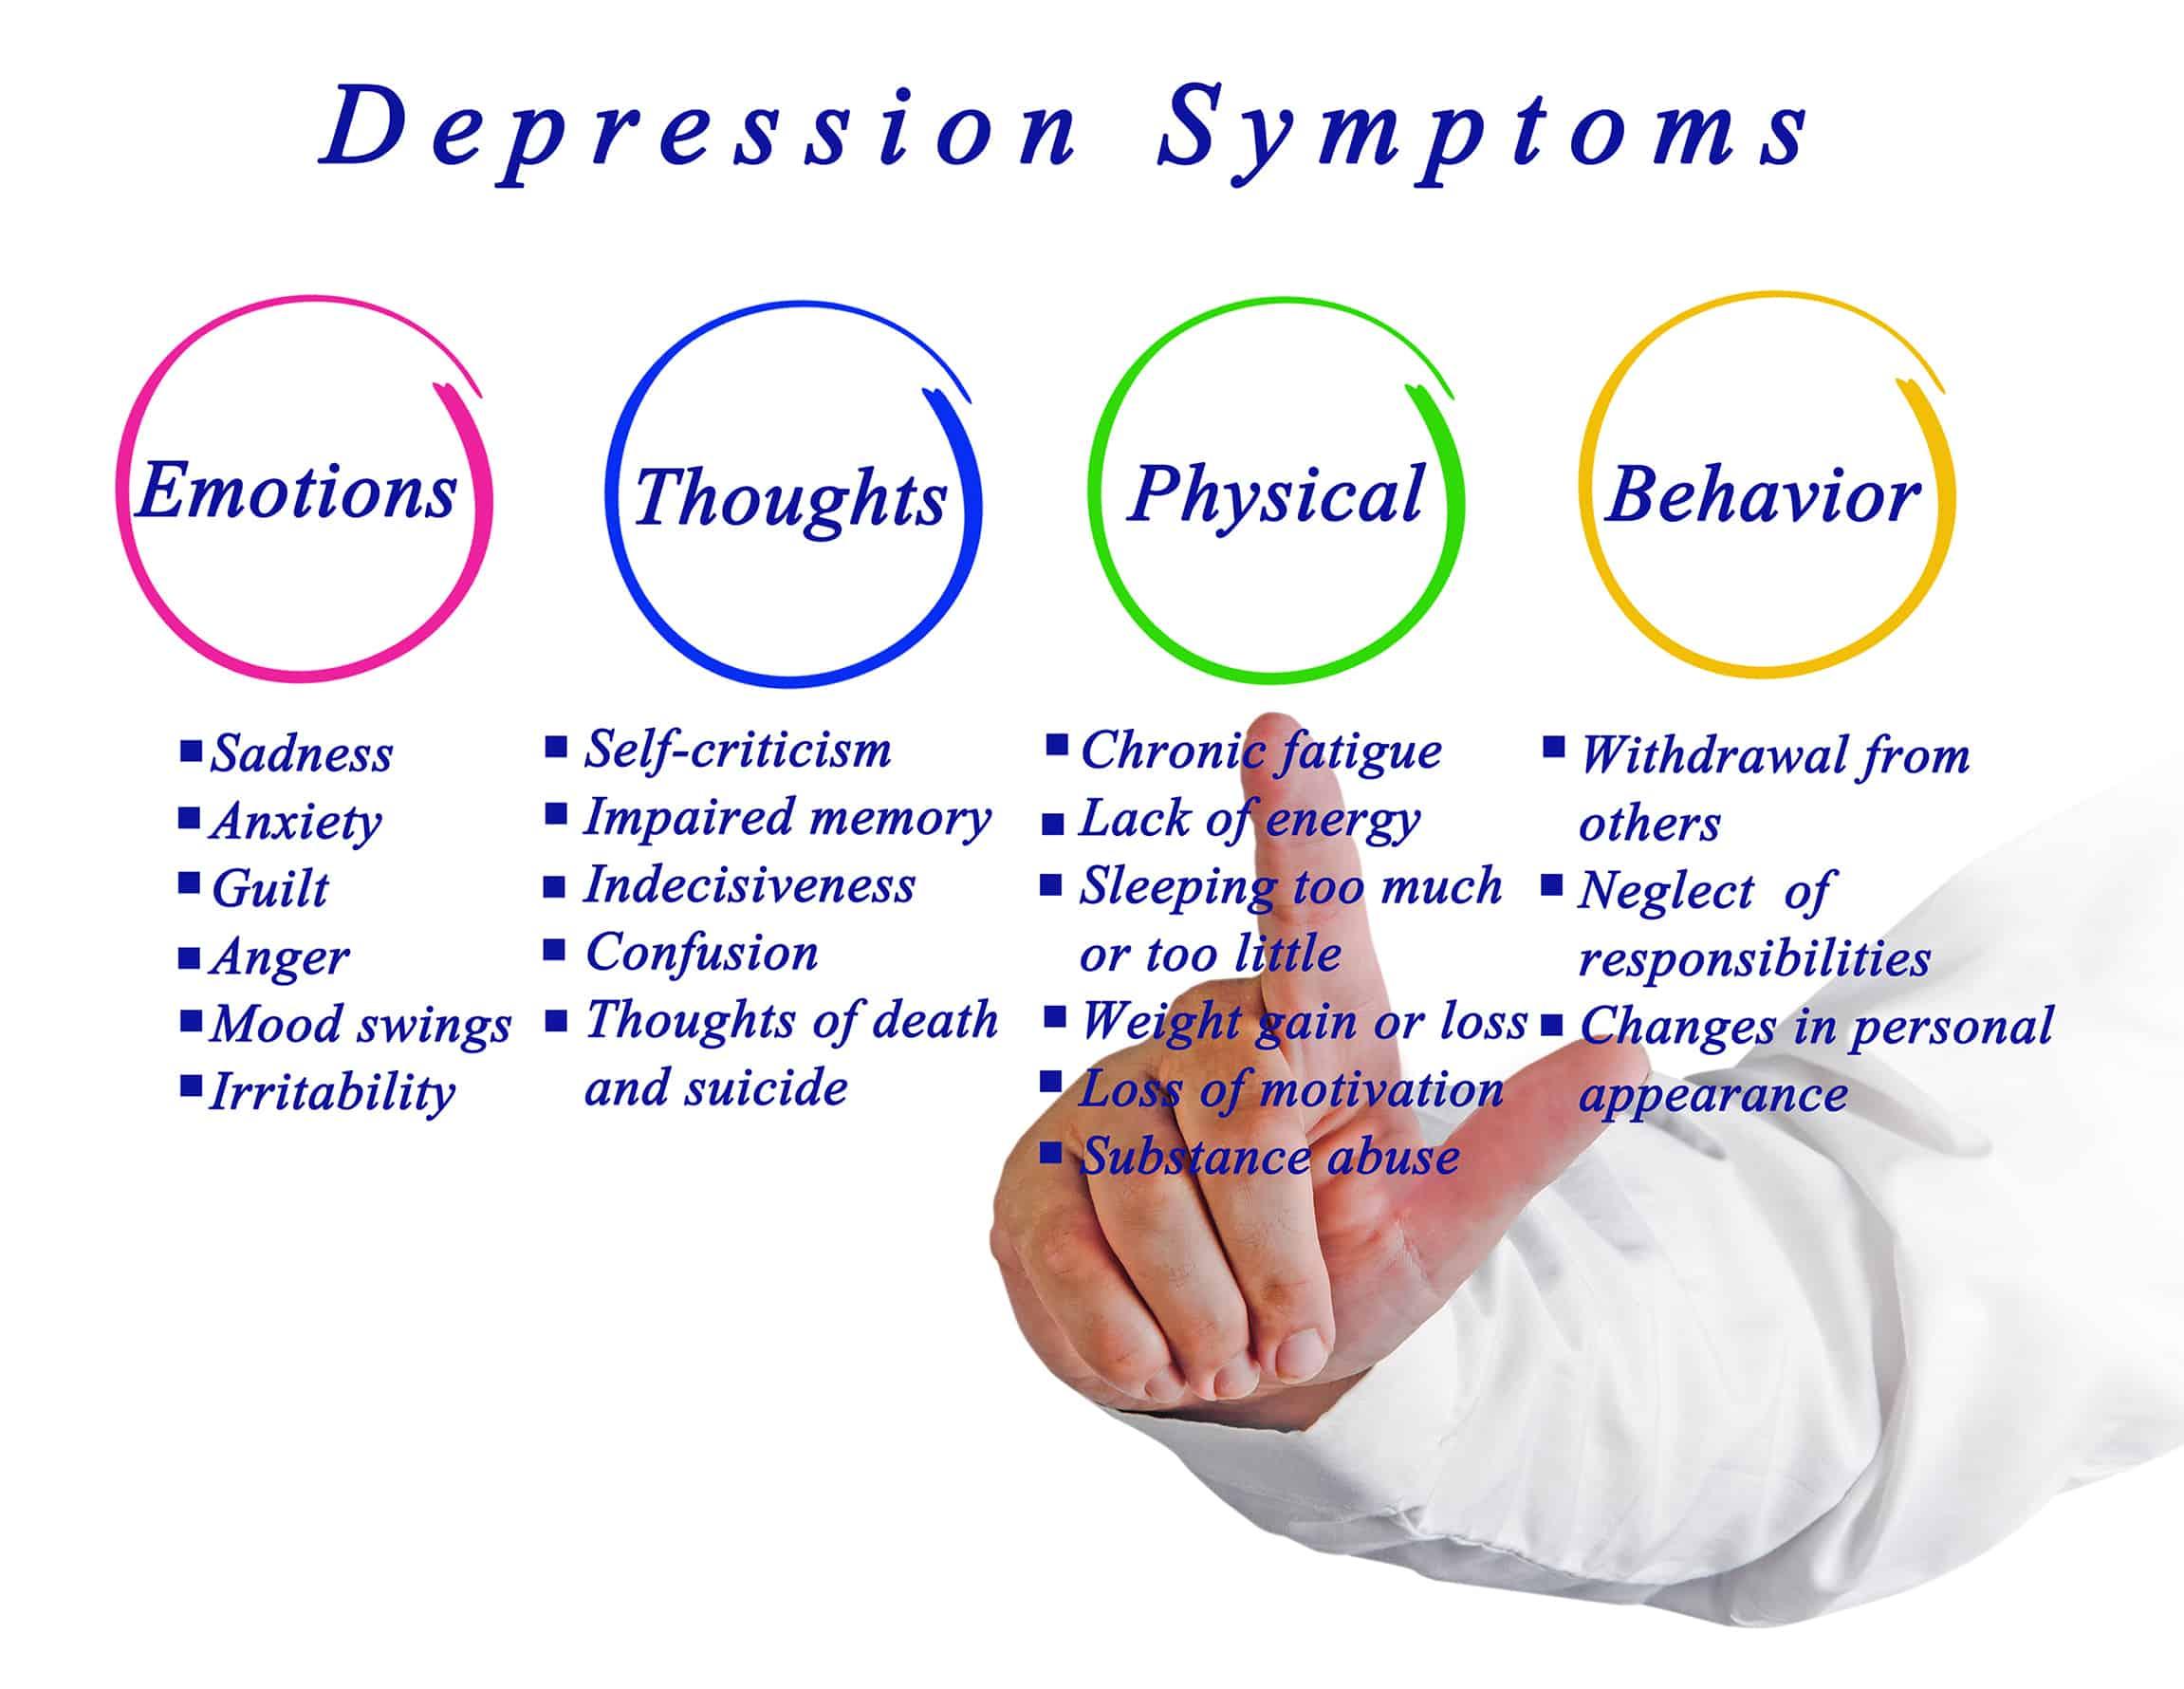 Symptoms of Depression in Veterans